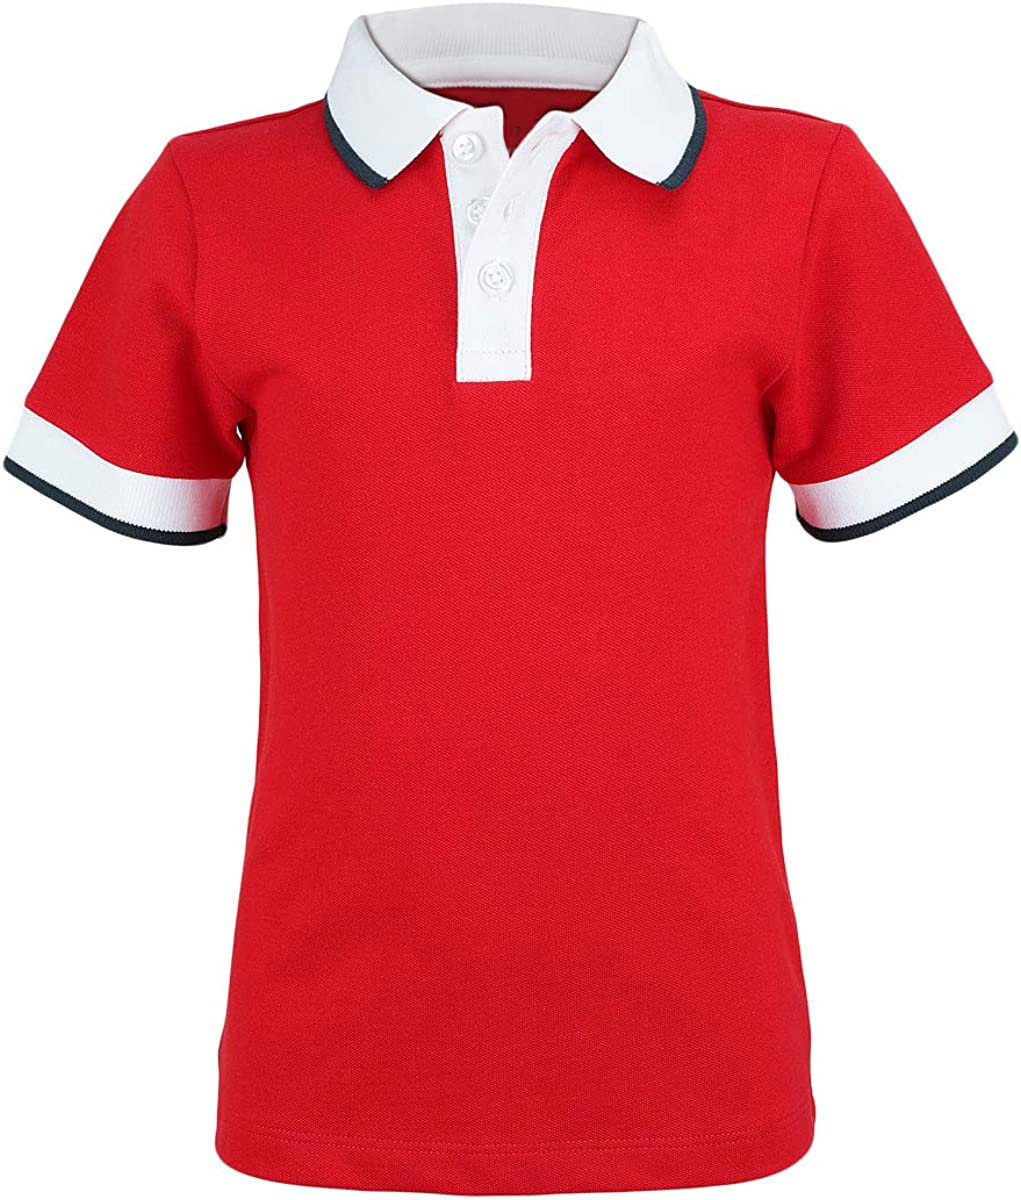 The Season Essentials Kidsy Boys Short Sleeve T-Shirt